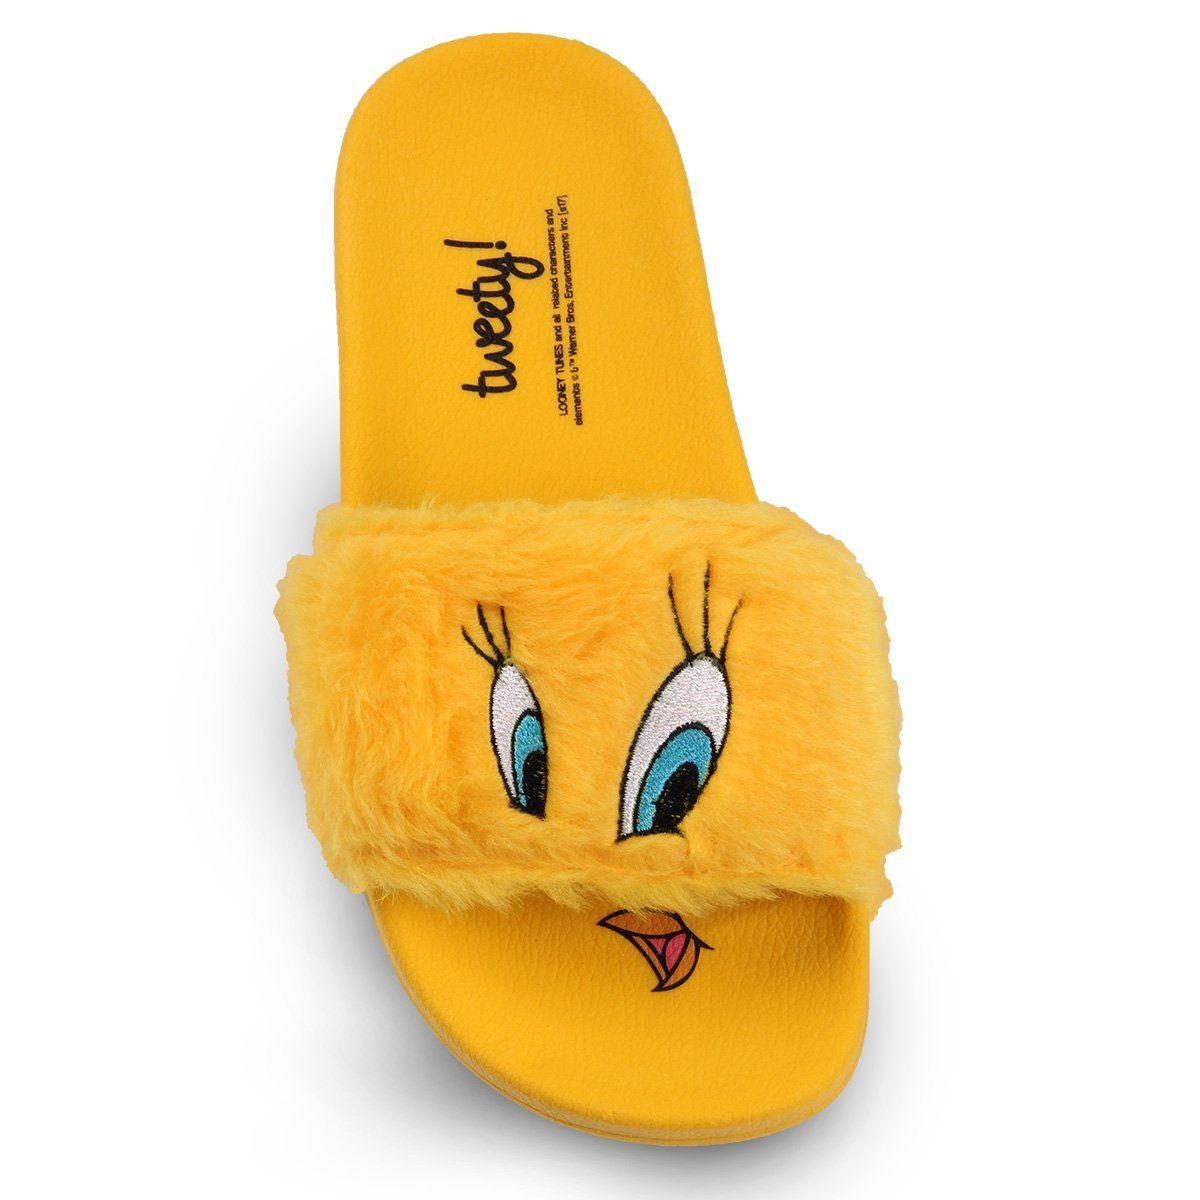 Chinelo Slide Looney Tunes Piu-Piu